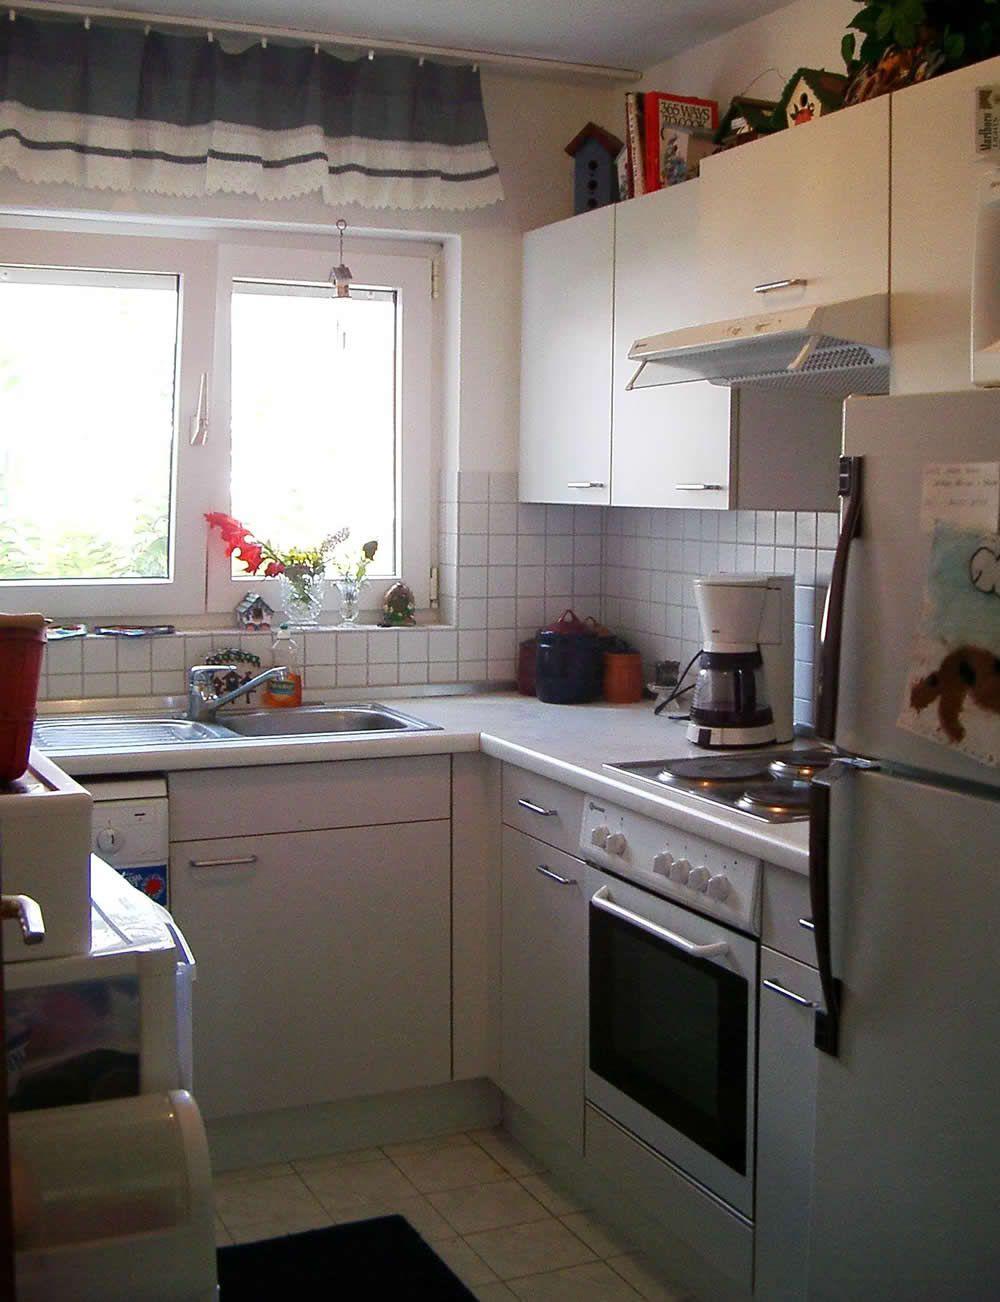 Pin von Zlatina Mitova auf My Tiny Studio | Pinterest | Küche ...